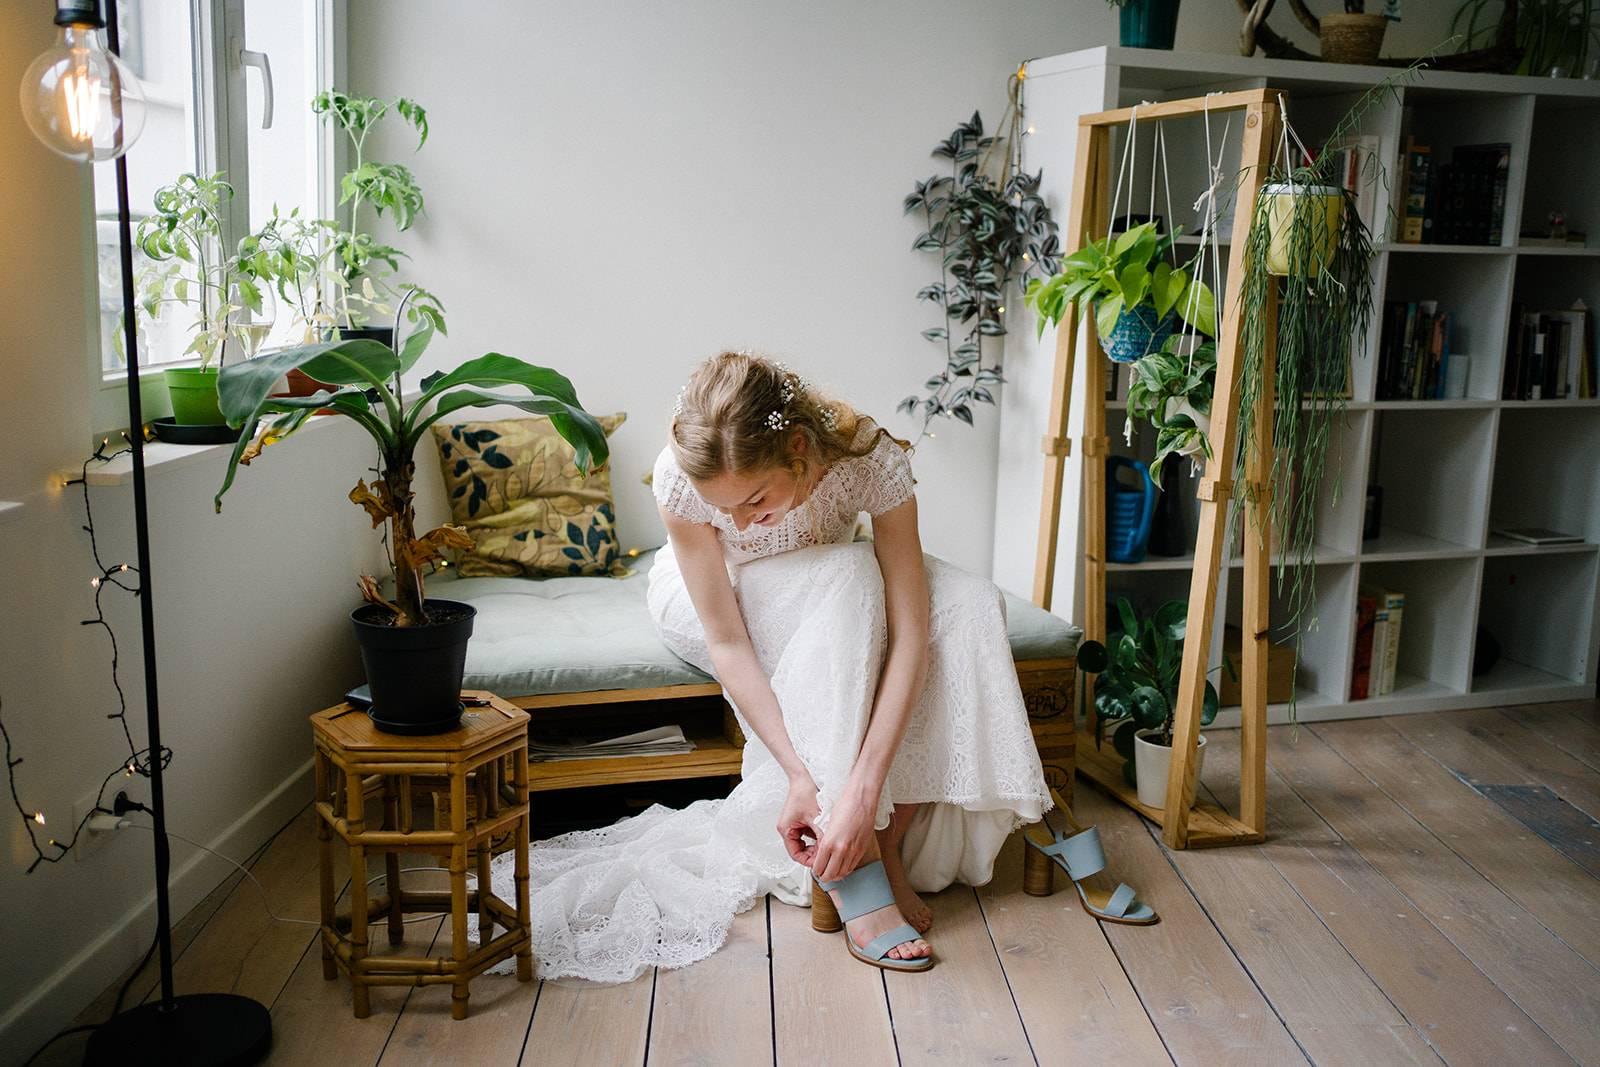 Hilde Eyckmans - Anouk&Bart - Hilde Eyckmans-84 - House of Weddings